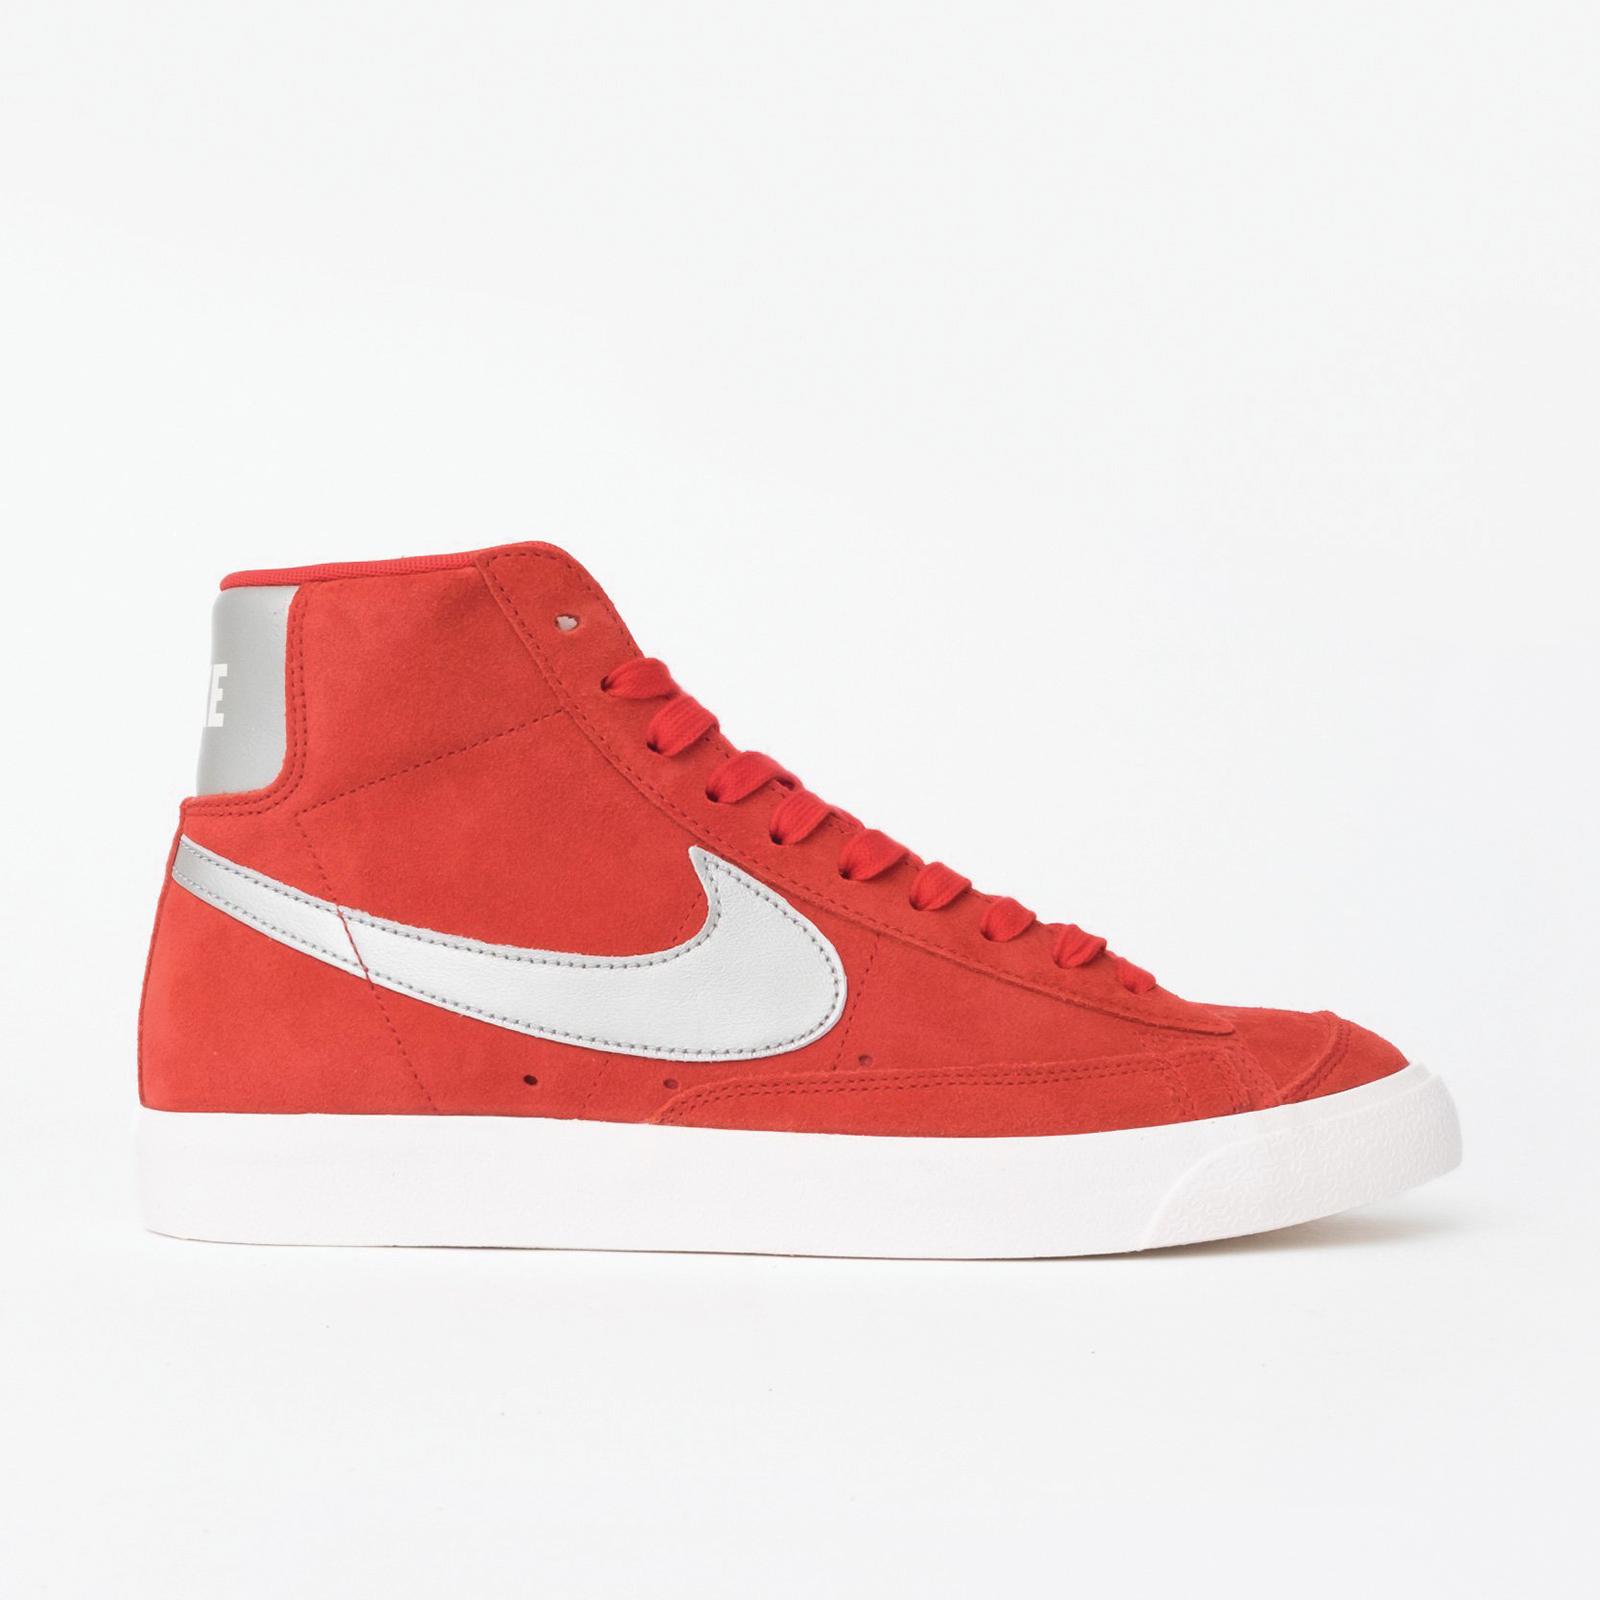 Nike Blazer 77 van Patta